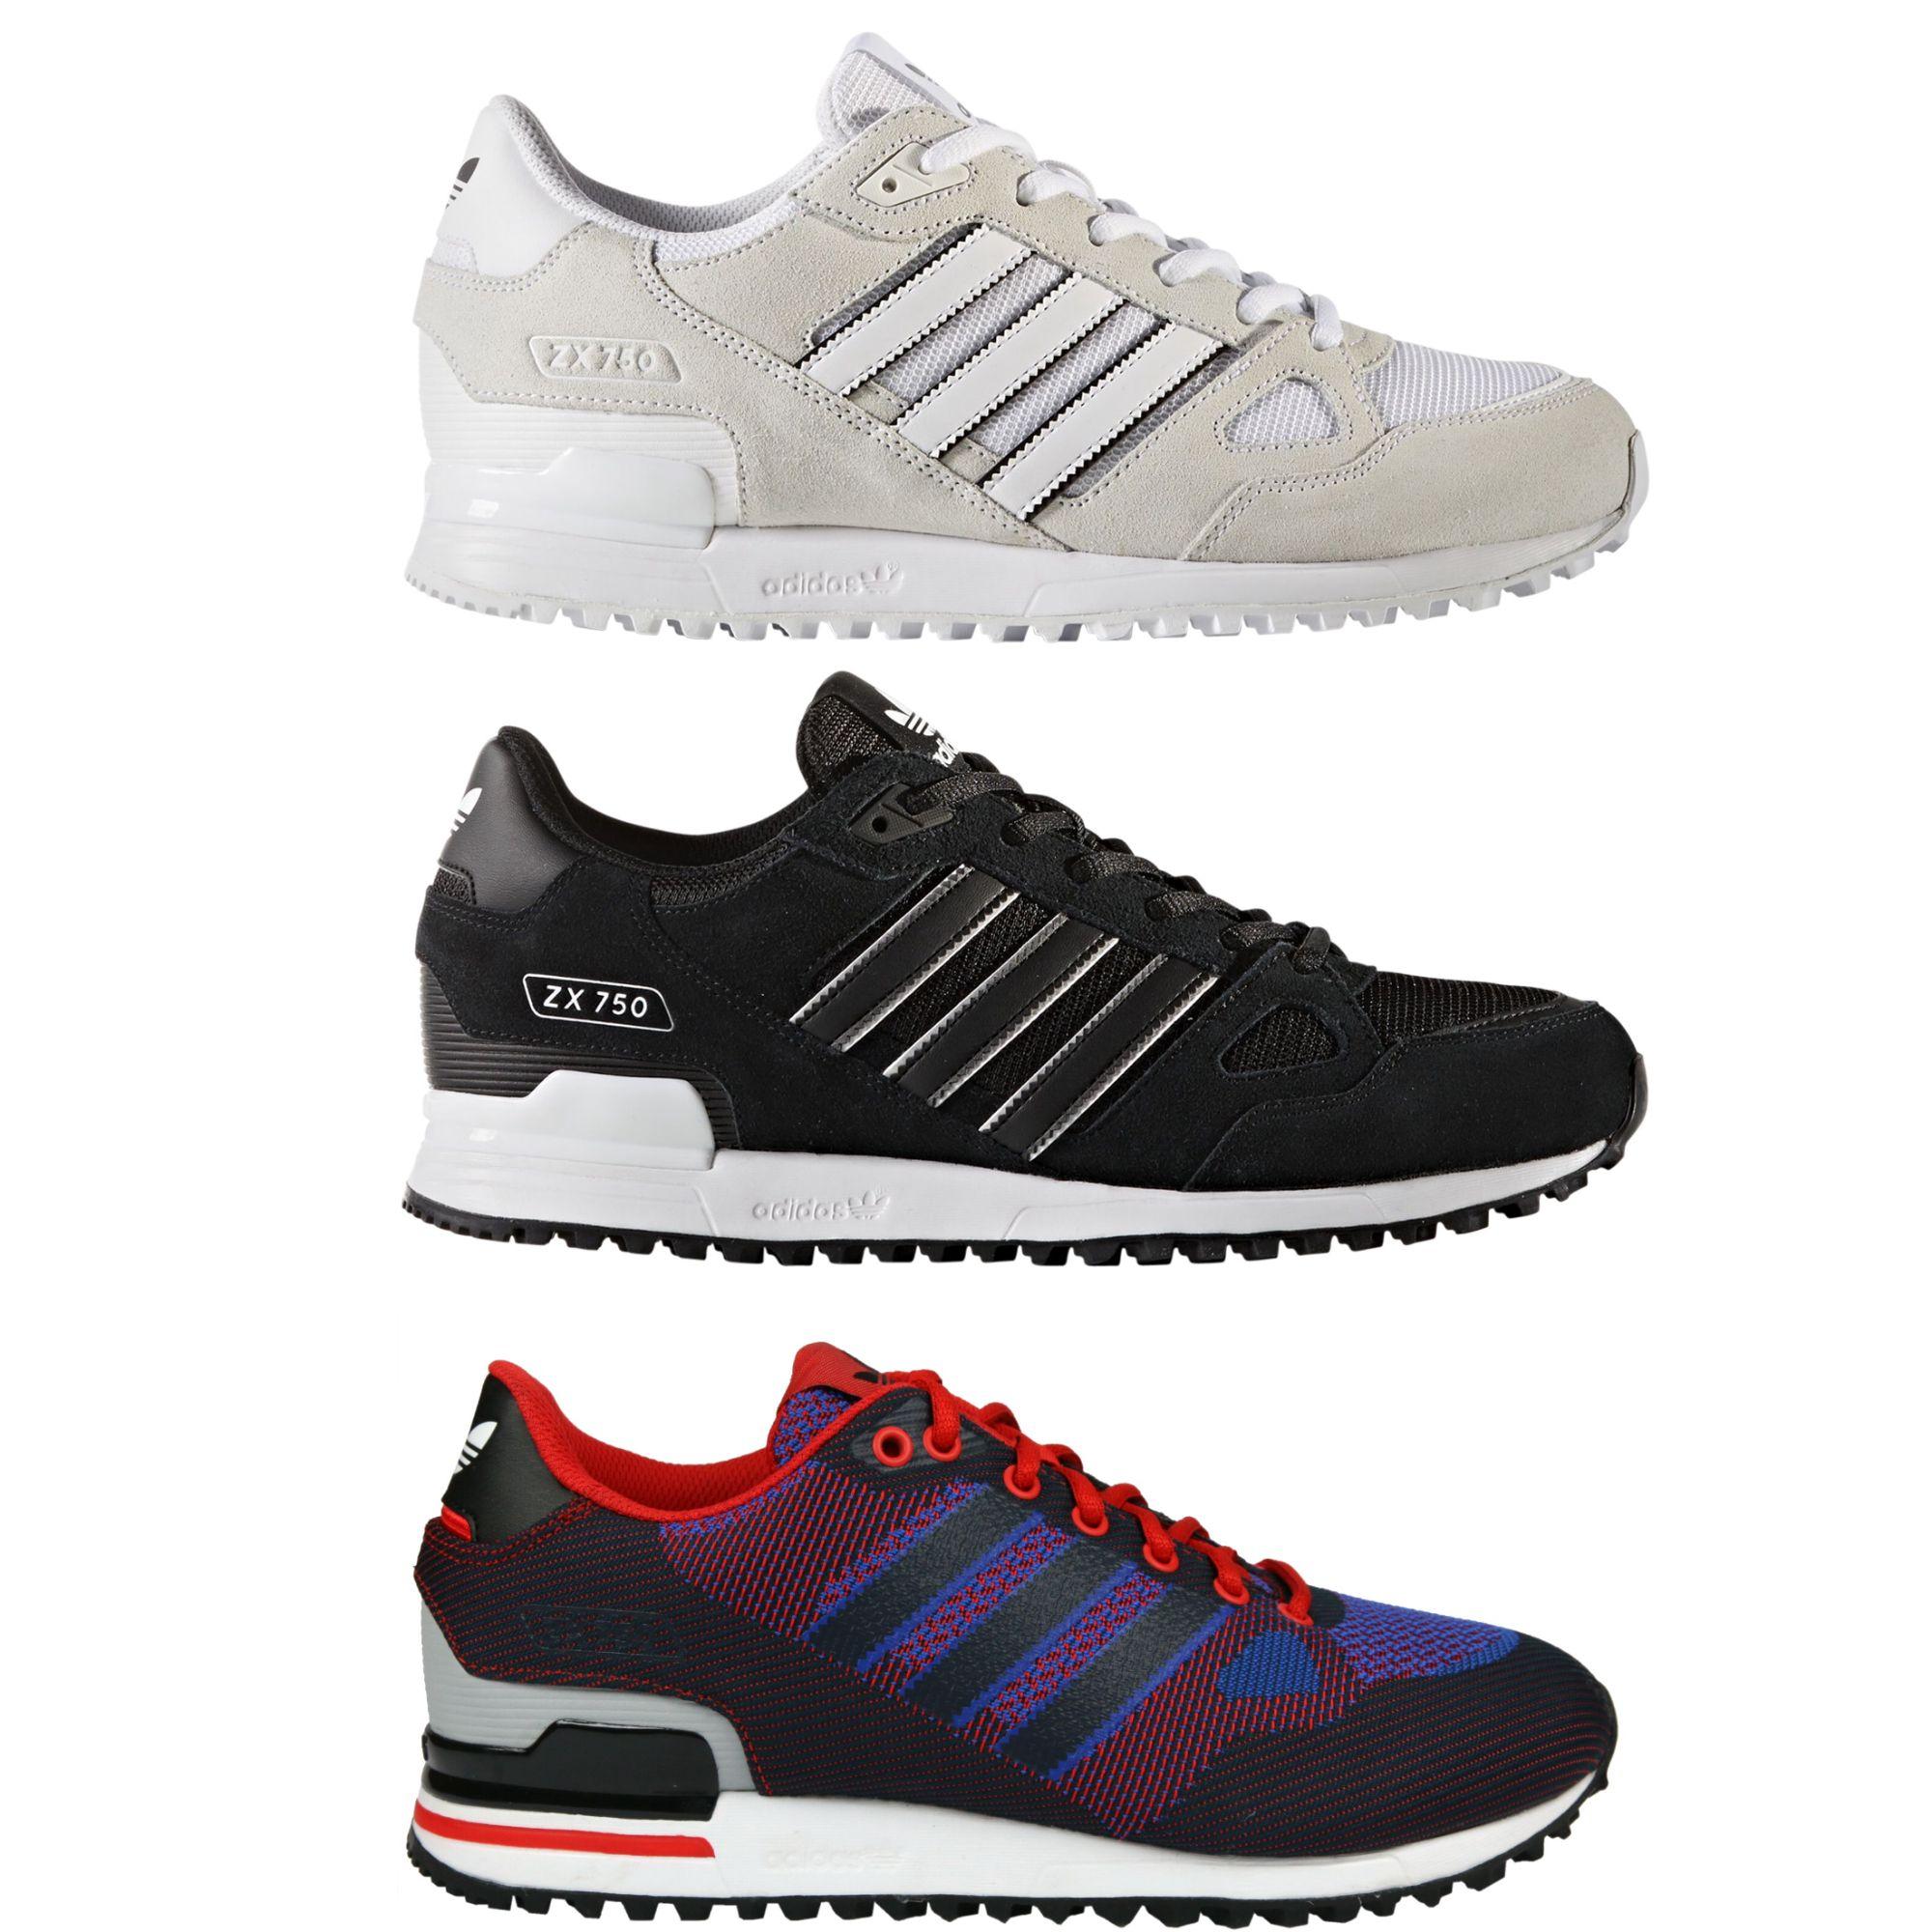 adidas originals zx 750 schuhe turnschuhe sneaker herren. Black Bedroom Furniture Sets. Home Design Ideas